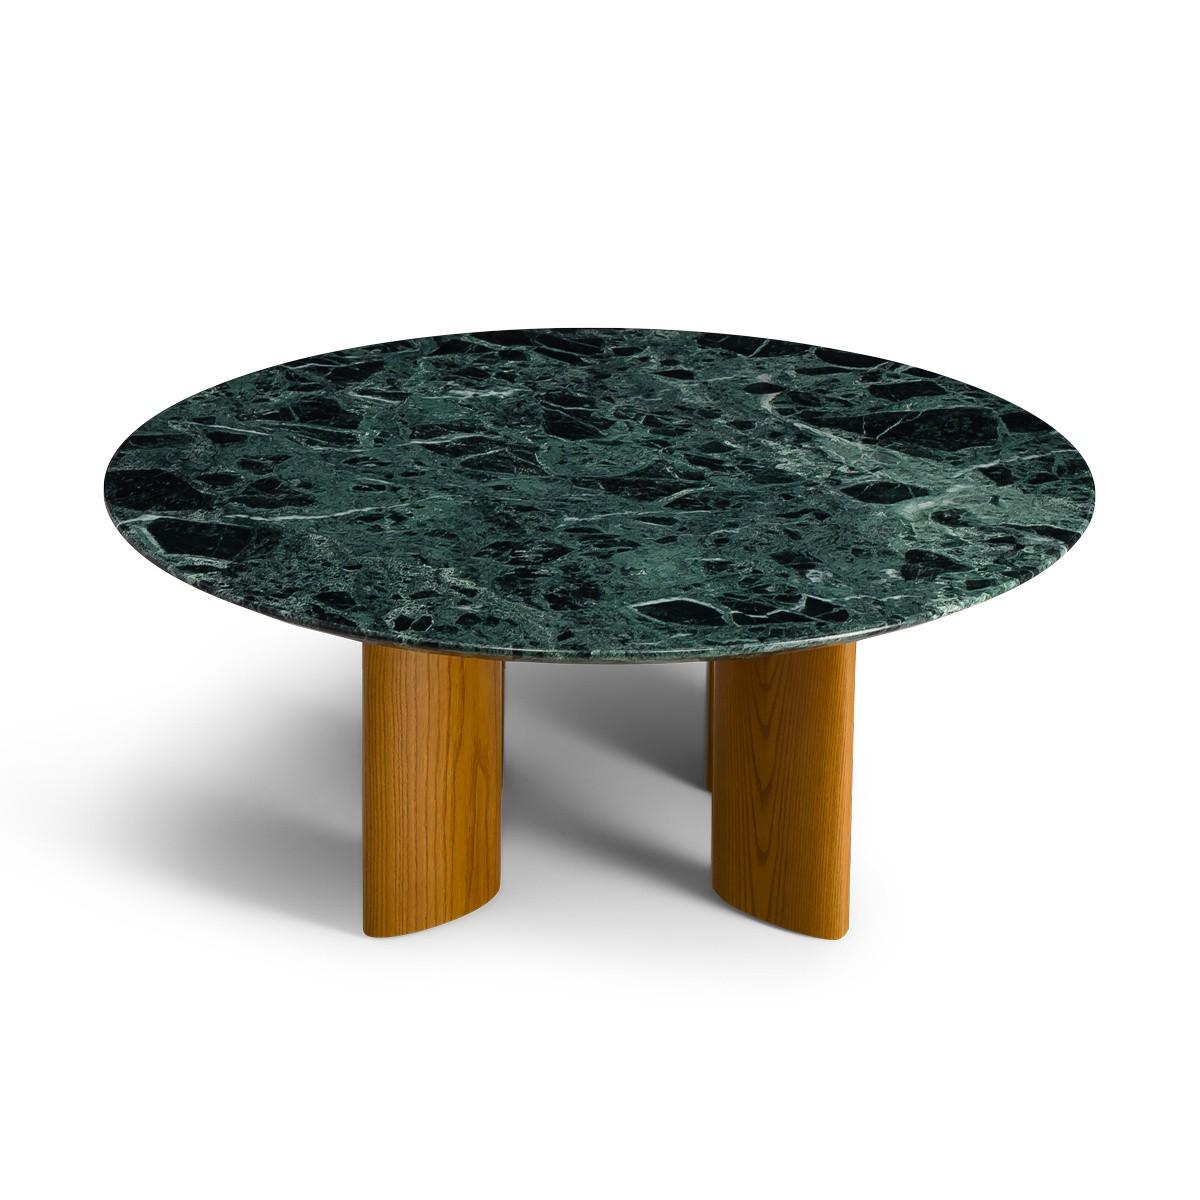 Table basse Carlotta pieds frêne finition iroko et marbre vert